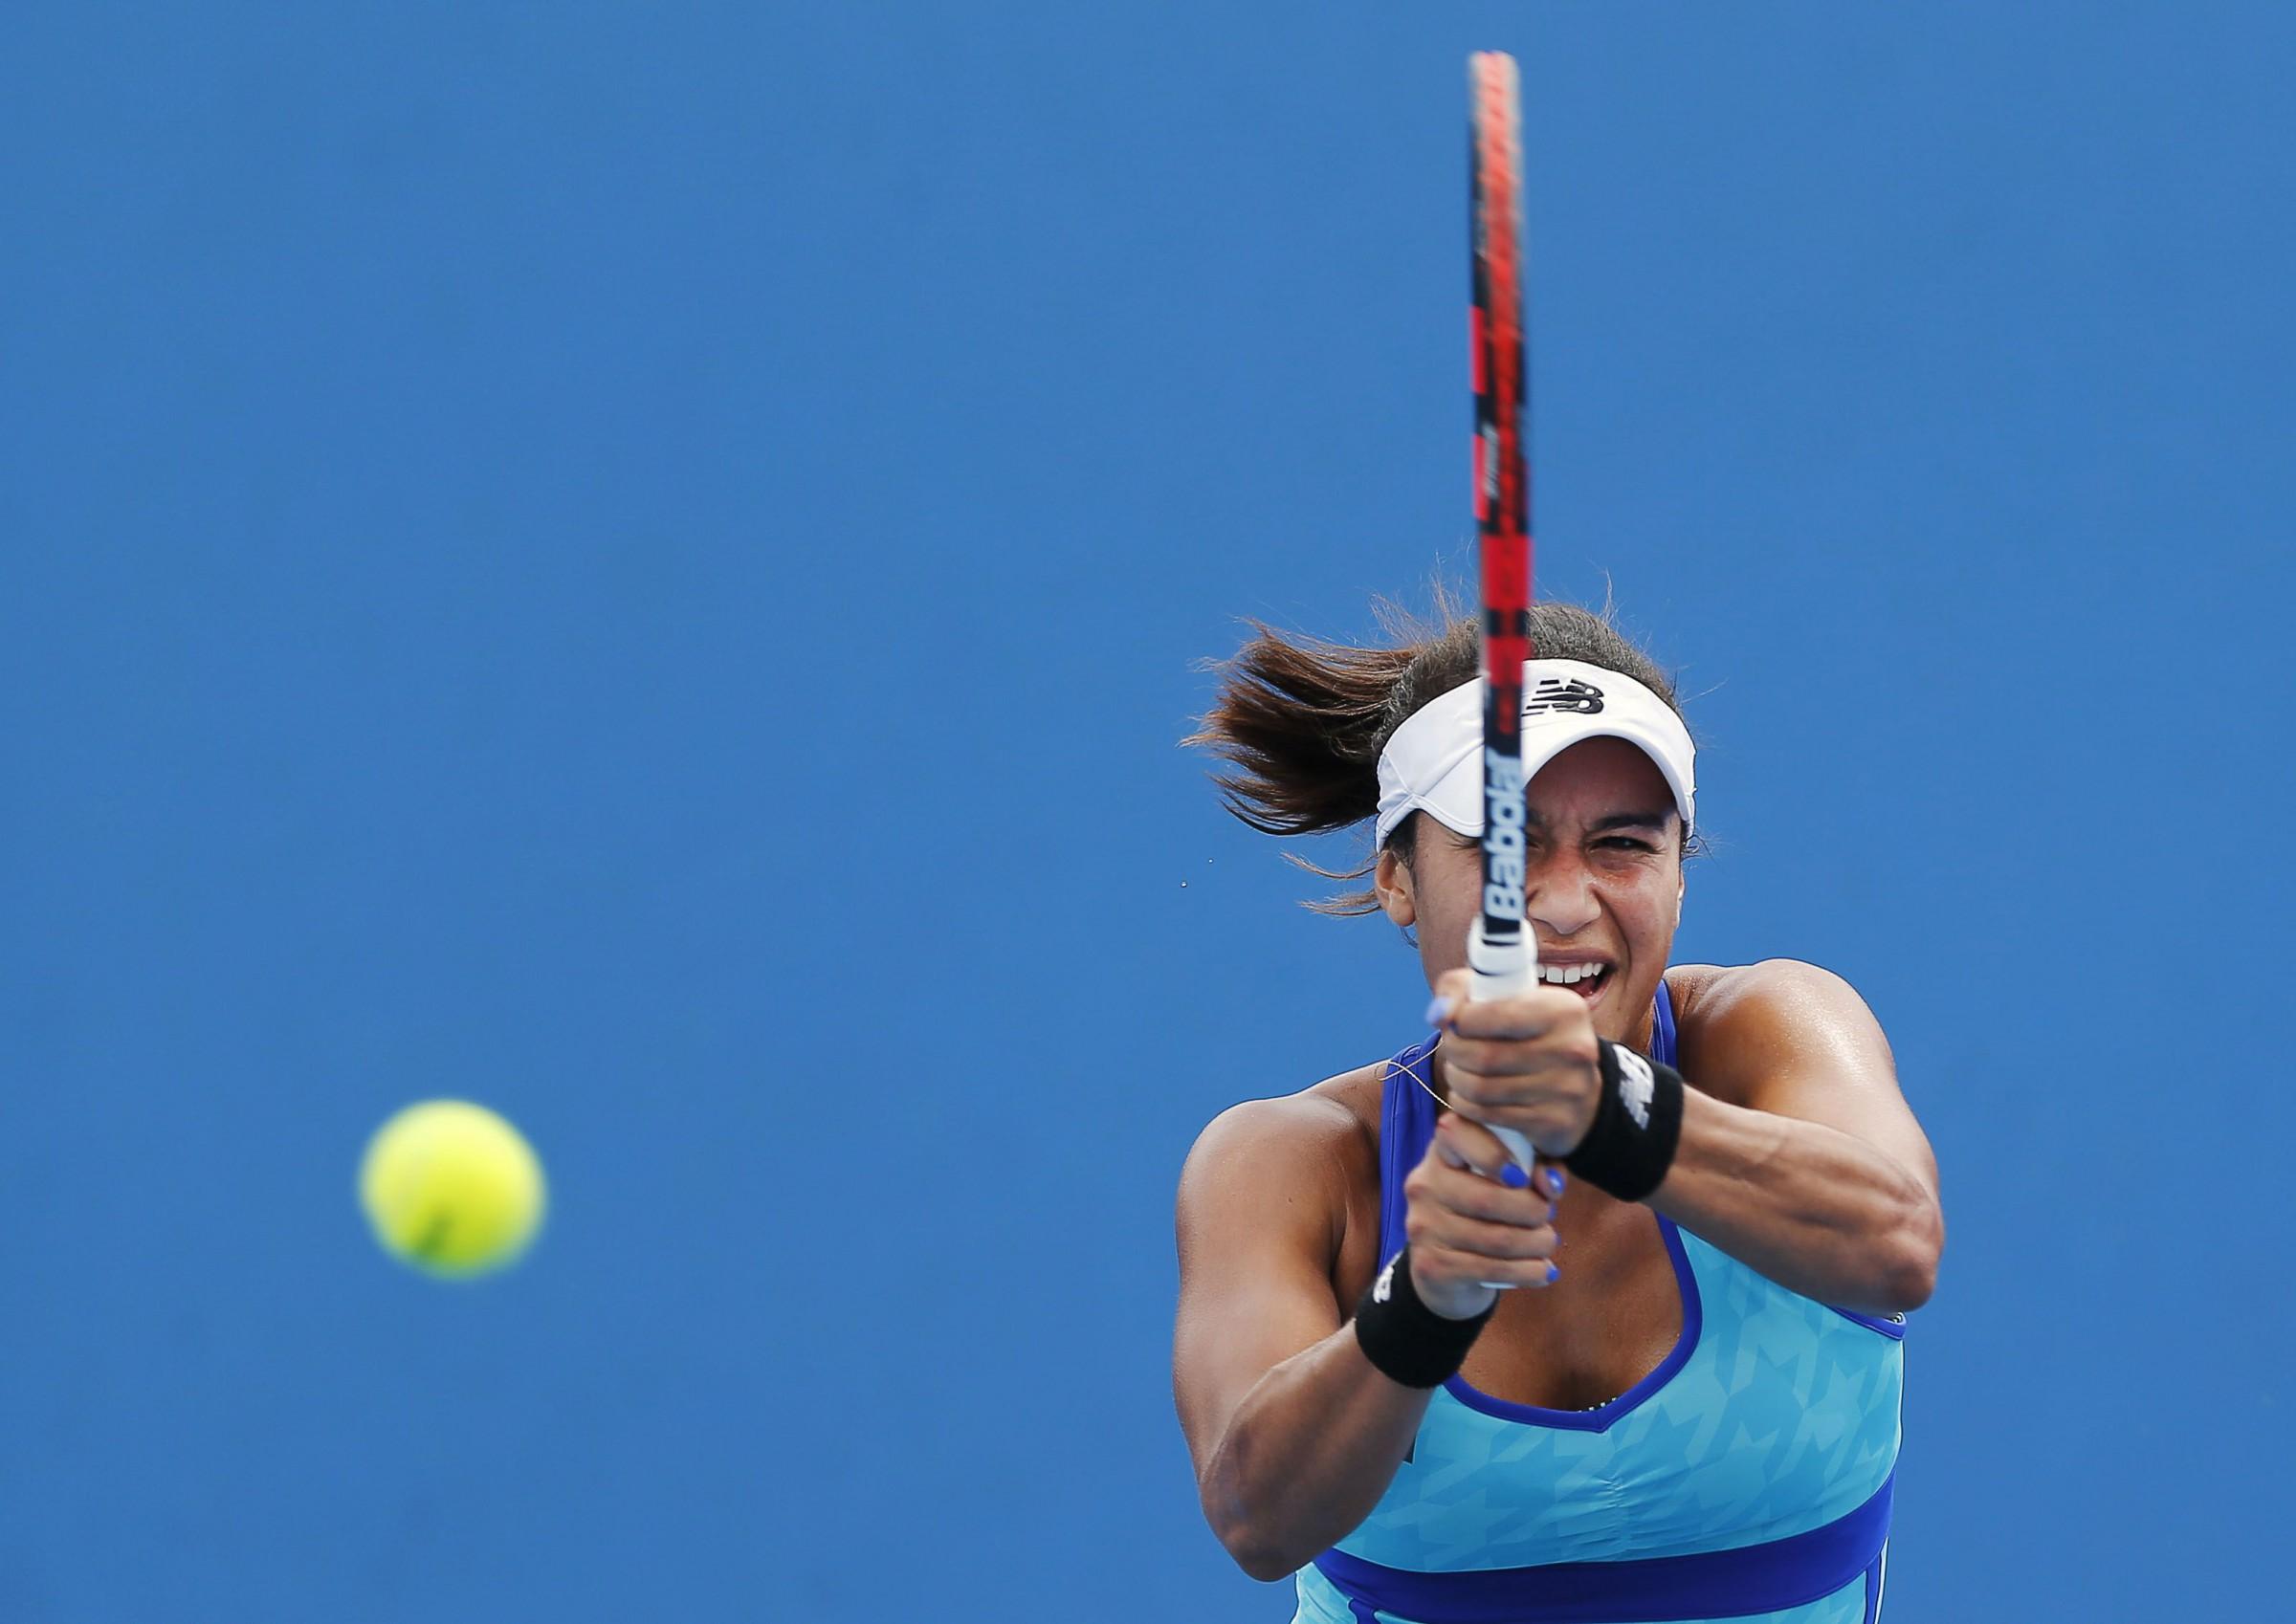 Heather Watson of Britain hits a return to Tsvetana Pironkova of Bulgaria during their women's singles first round match at the Australian Open 2015.